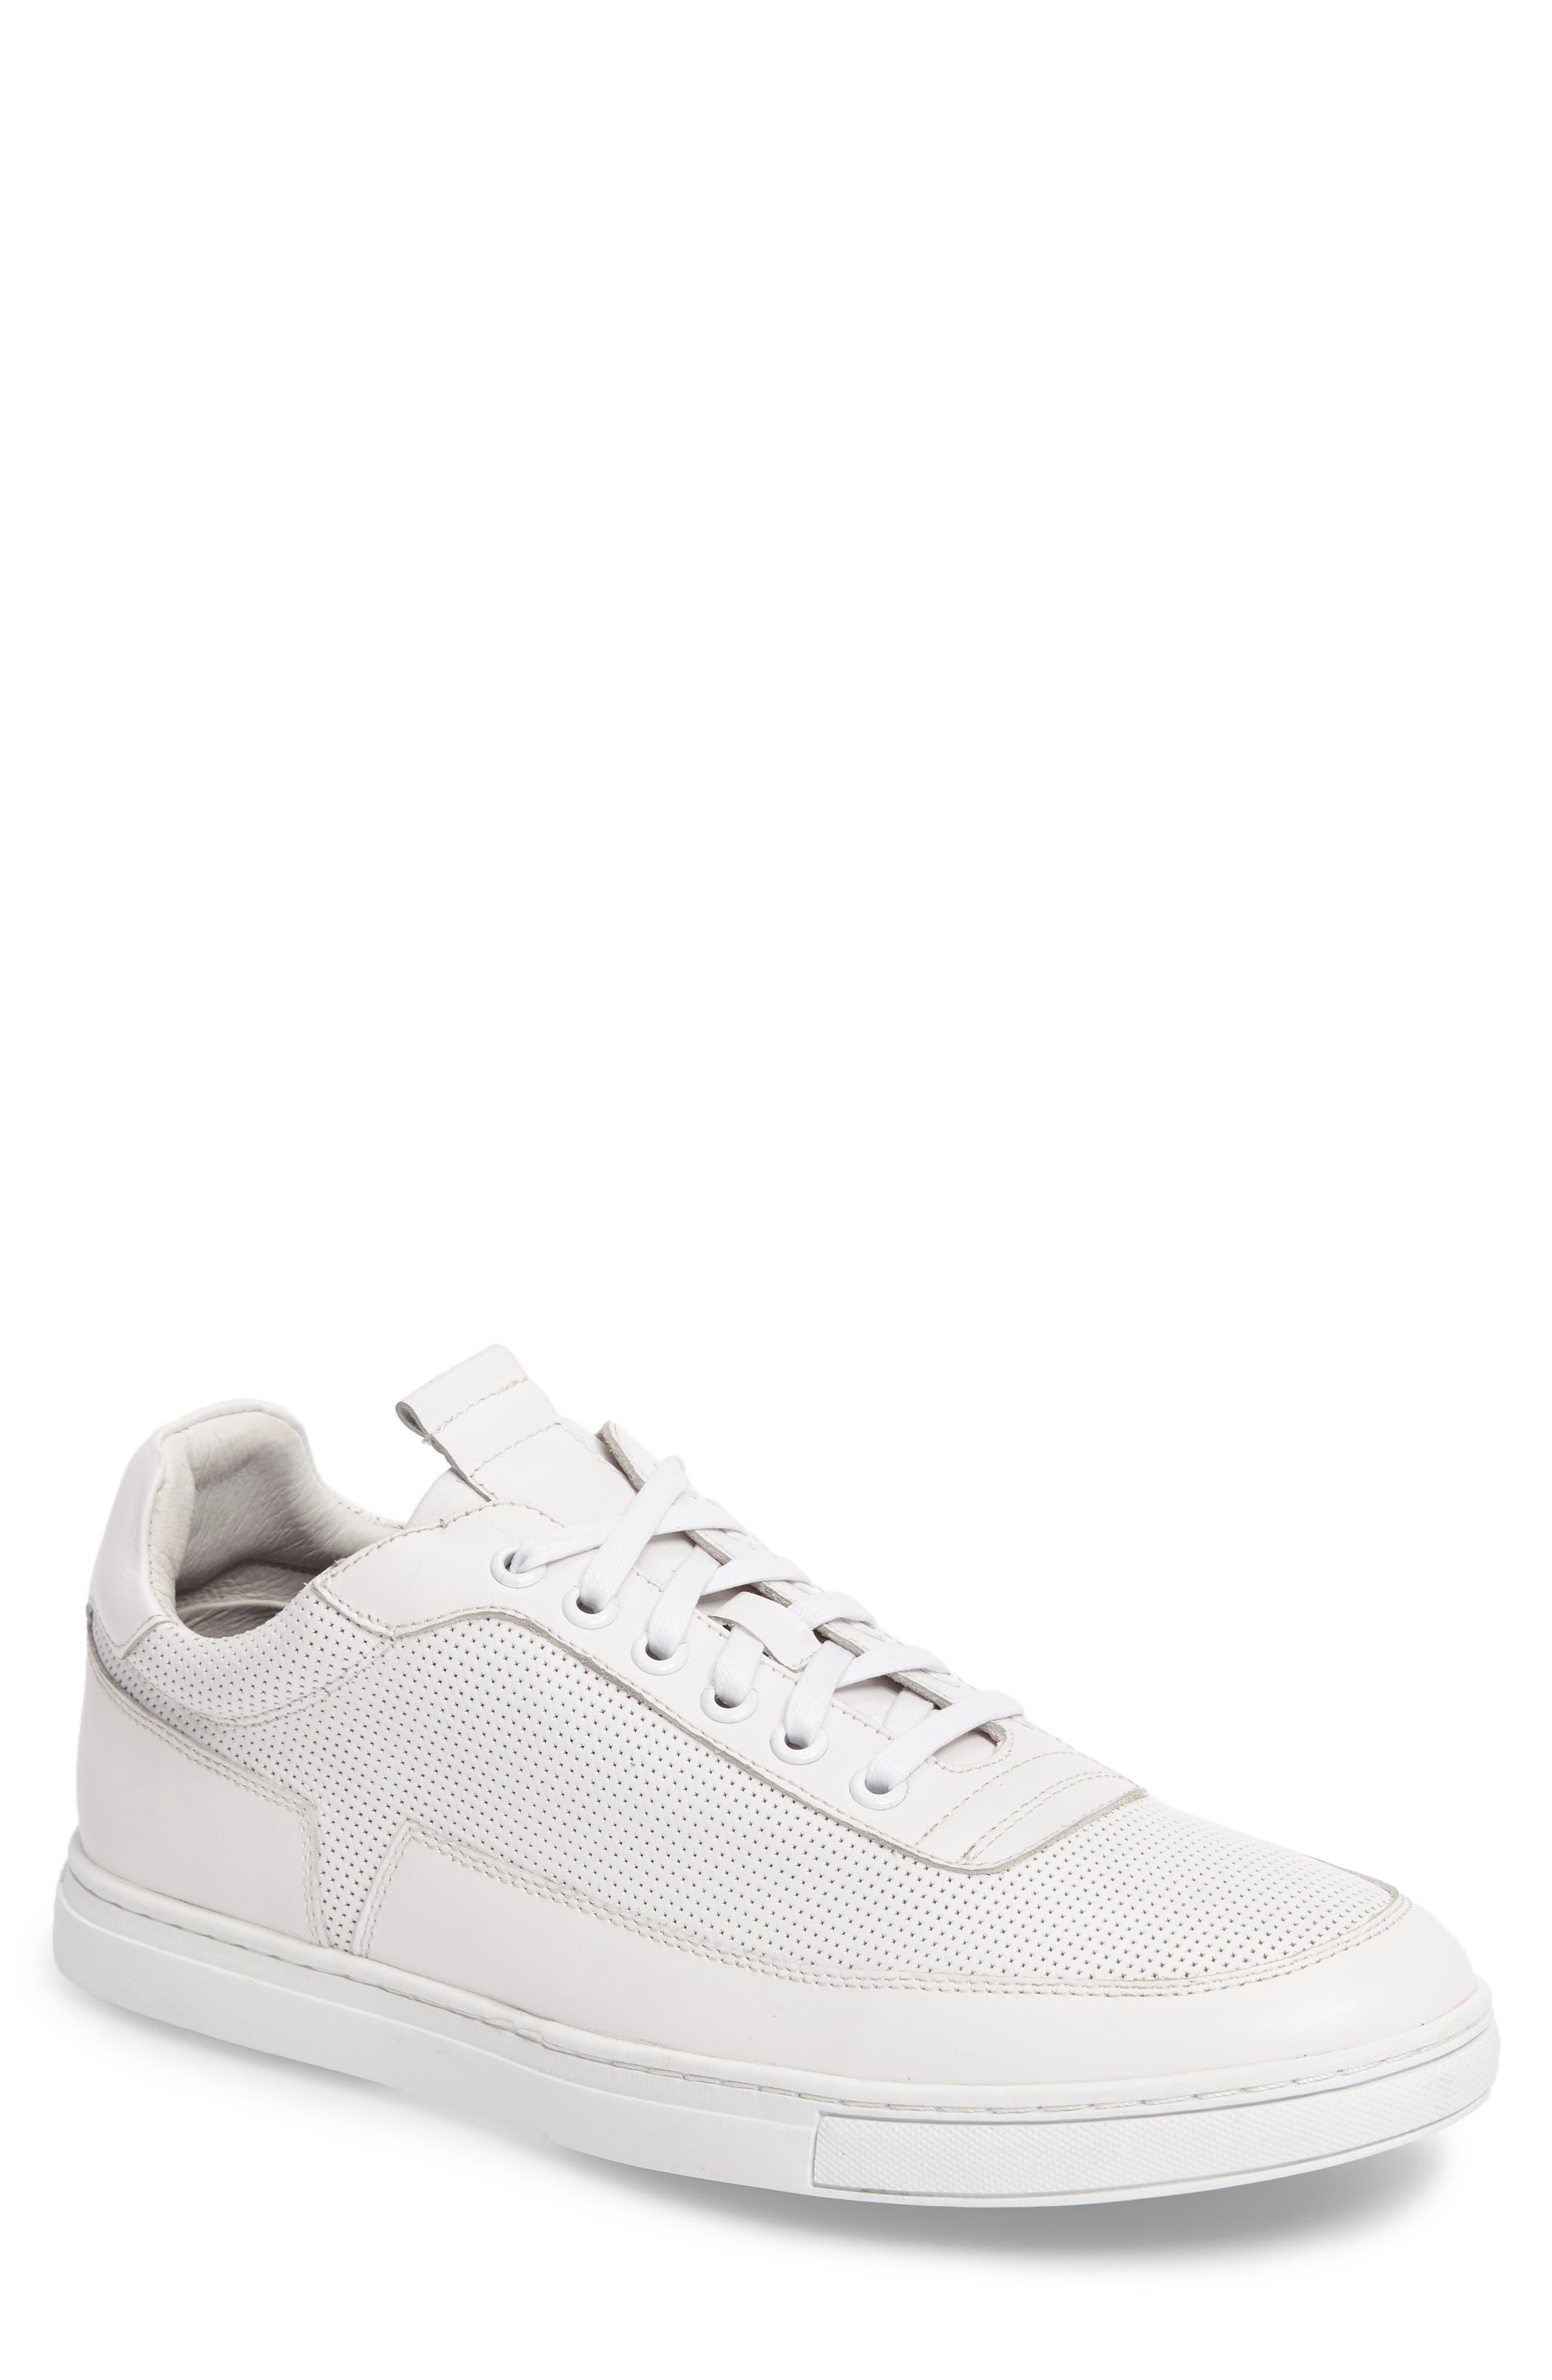 ZANZARA Harmony Sneaker